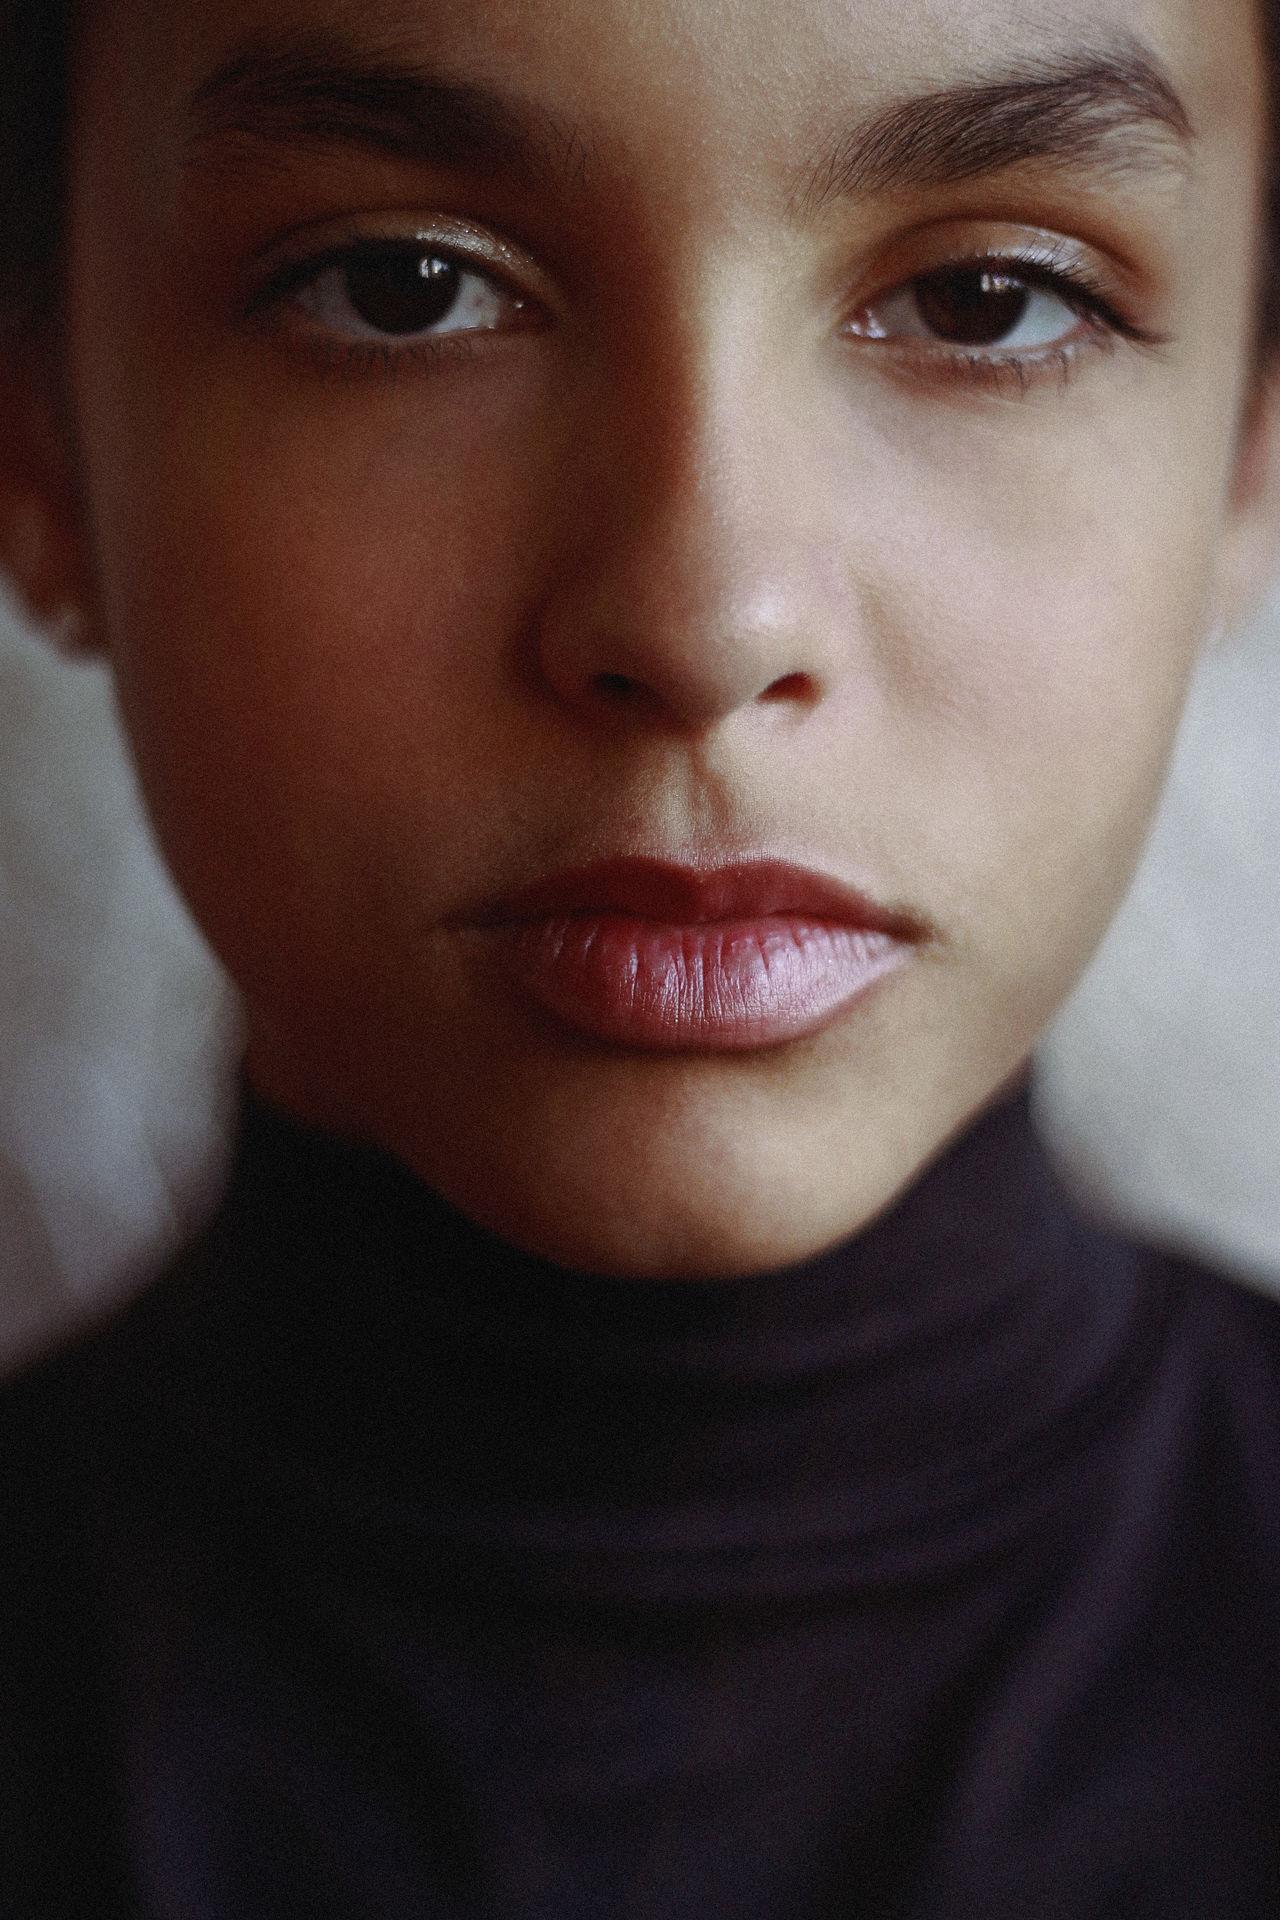 12-13 Years,  Brazil,  Close-Up,  Fashion,  Females